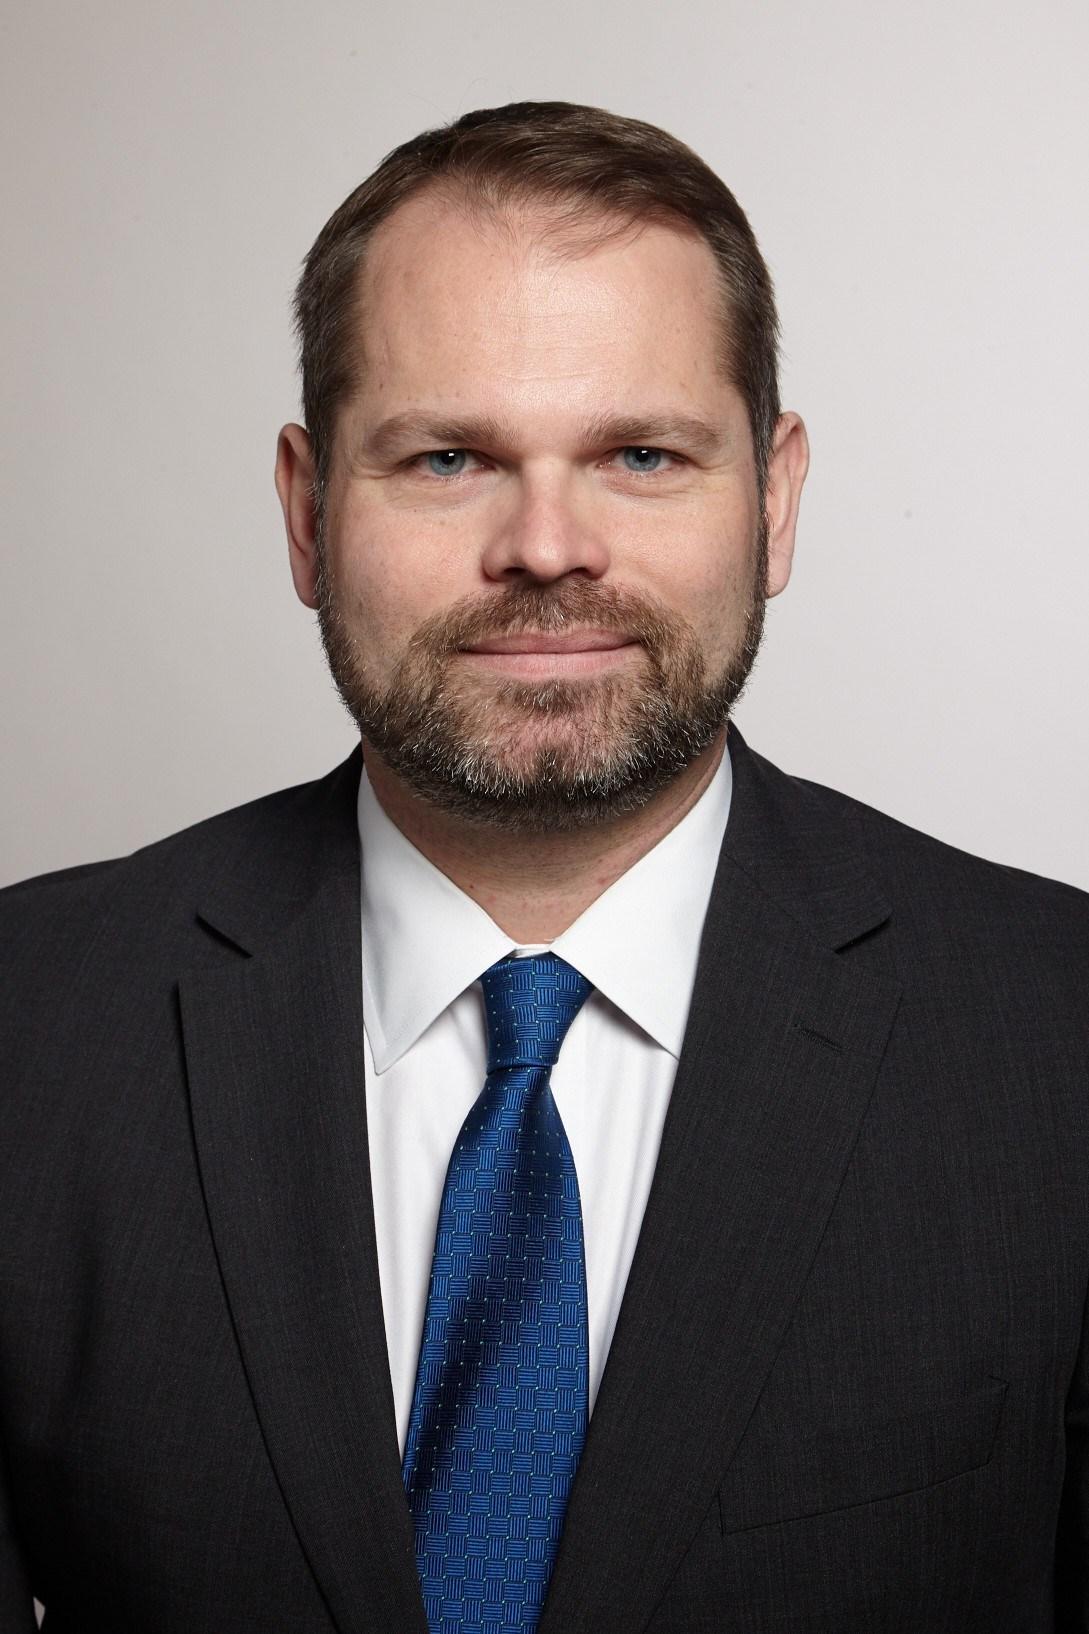 Michael Palese, Mount Sinai Urology Associates - Urology